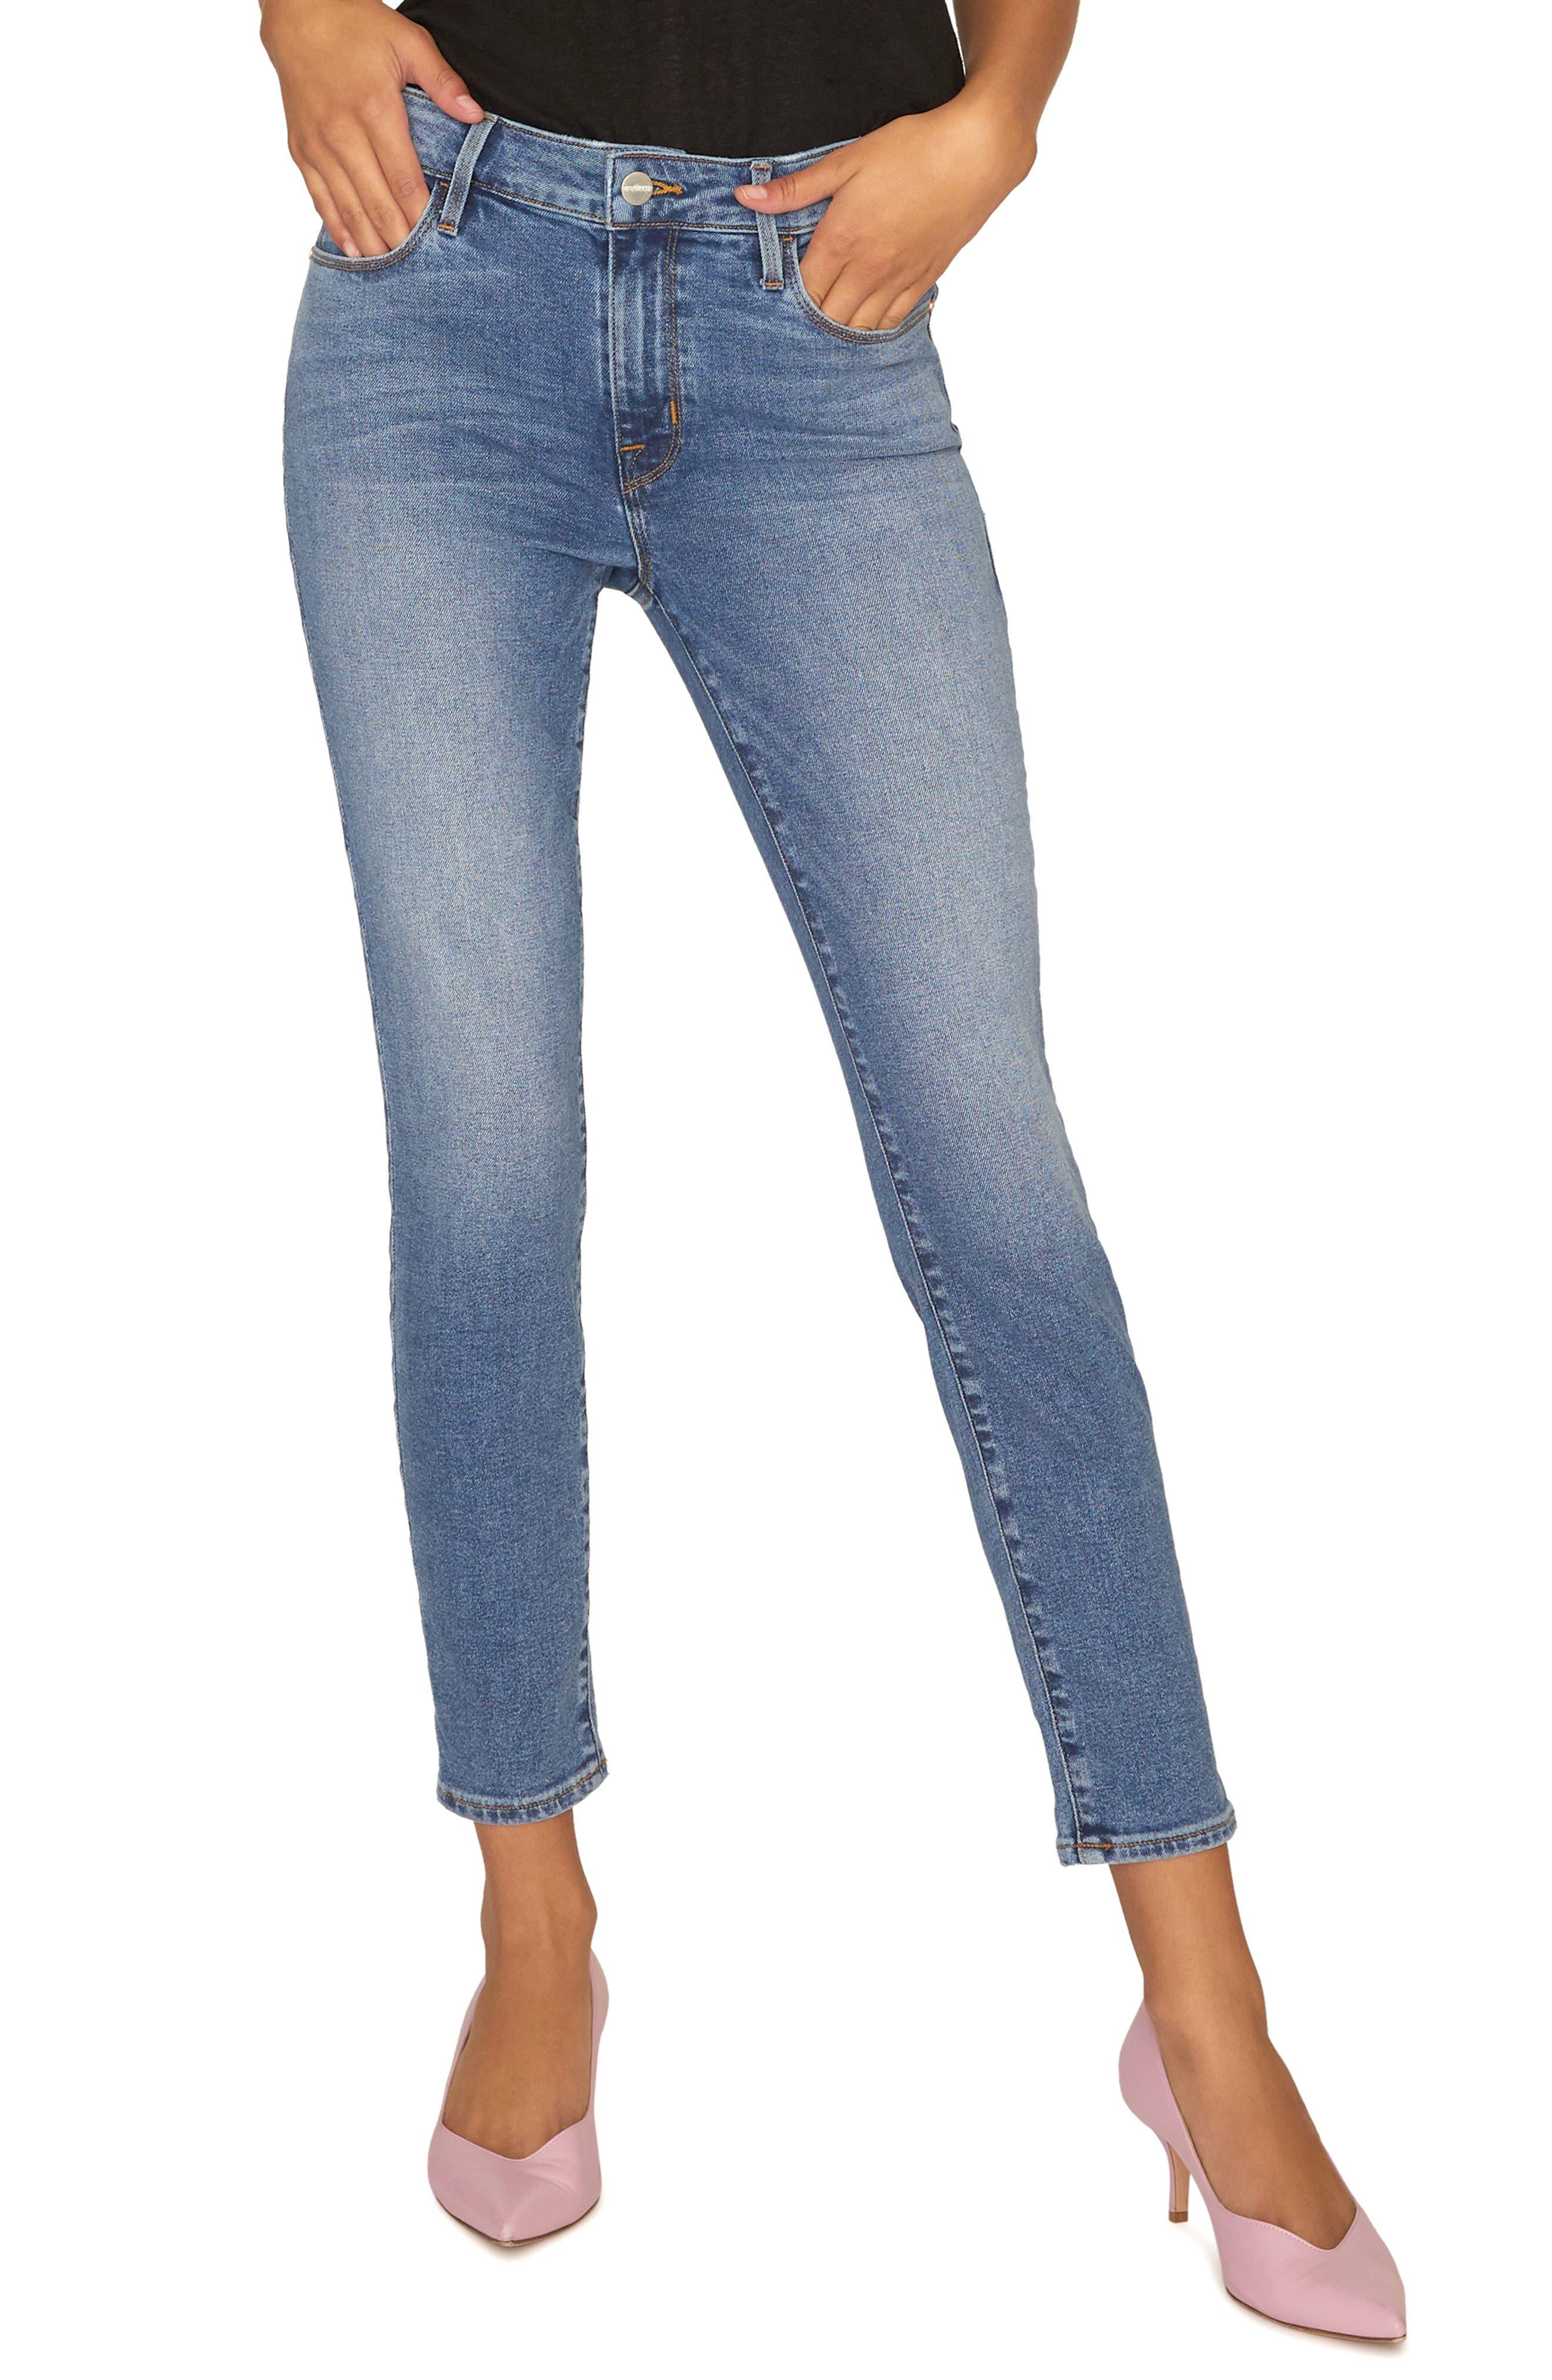 SANCTUARY, Social Standard Ankle Skinny Jeans, Main thumbnail 1, color, 422